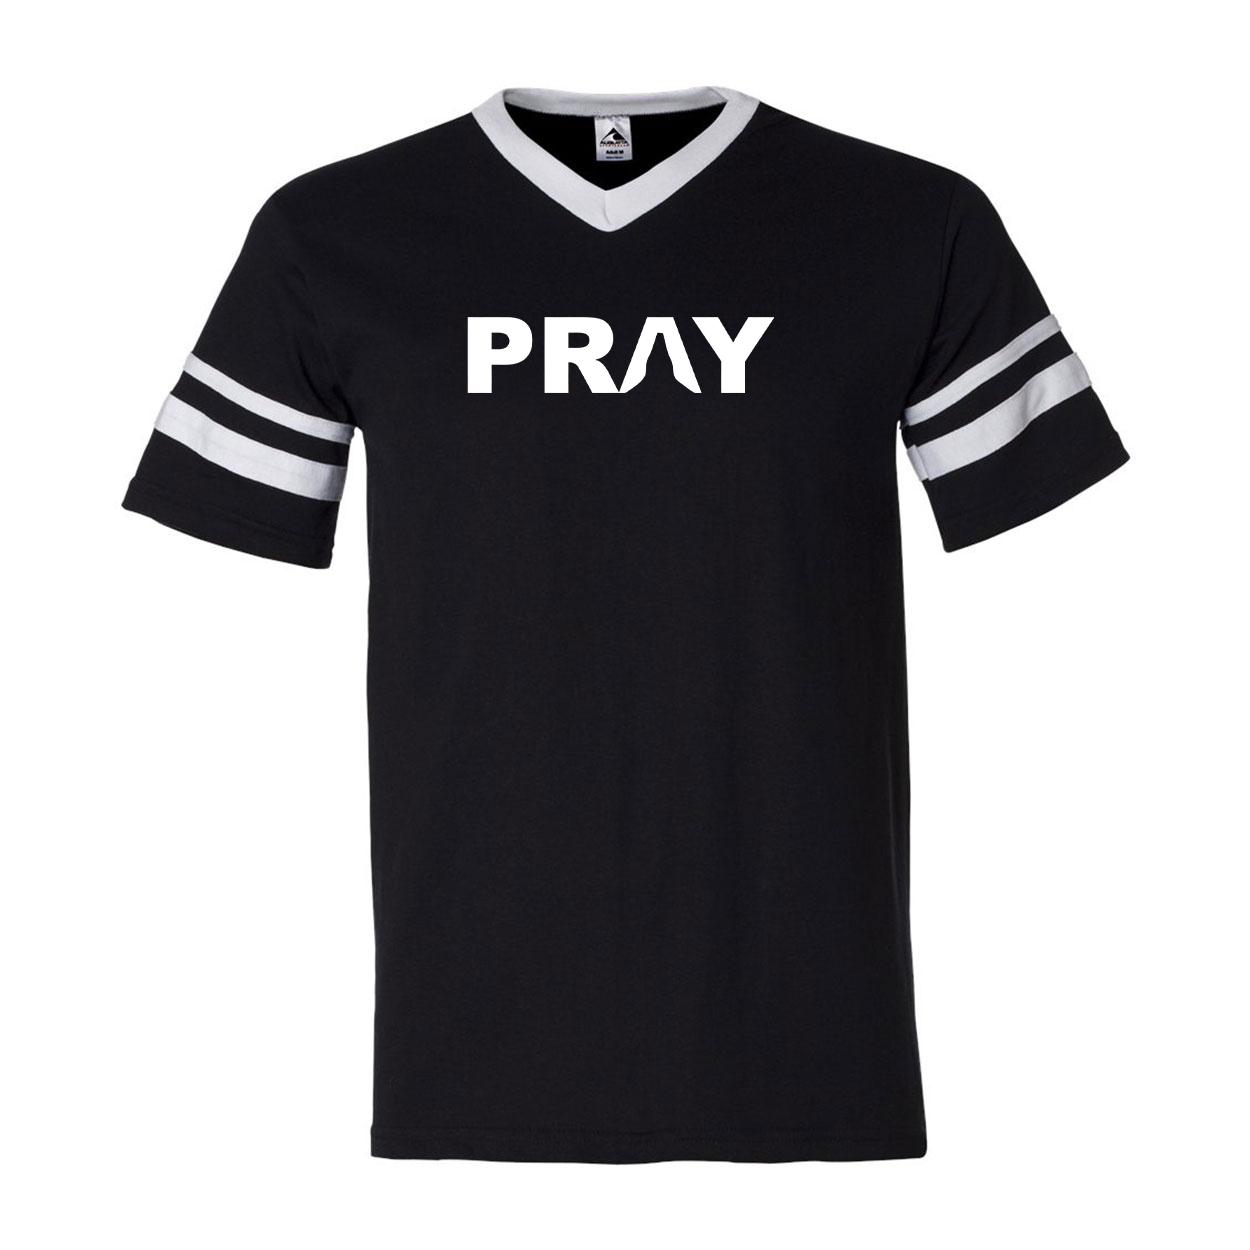 Pray Hands Logo Classic Premium Striped Jersey T-Shirt Black/White (White Logo)